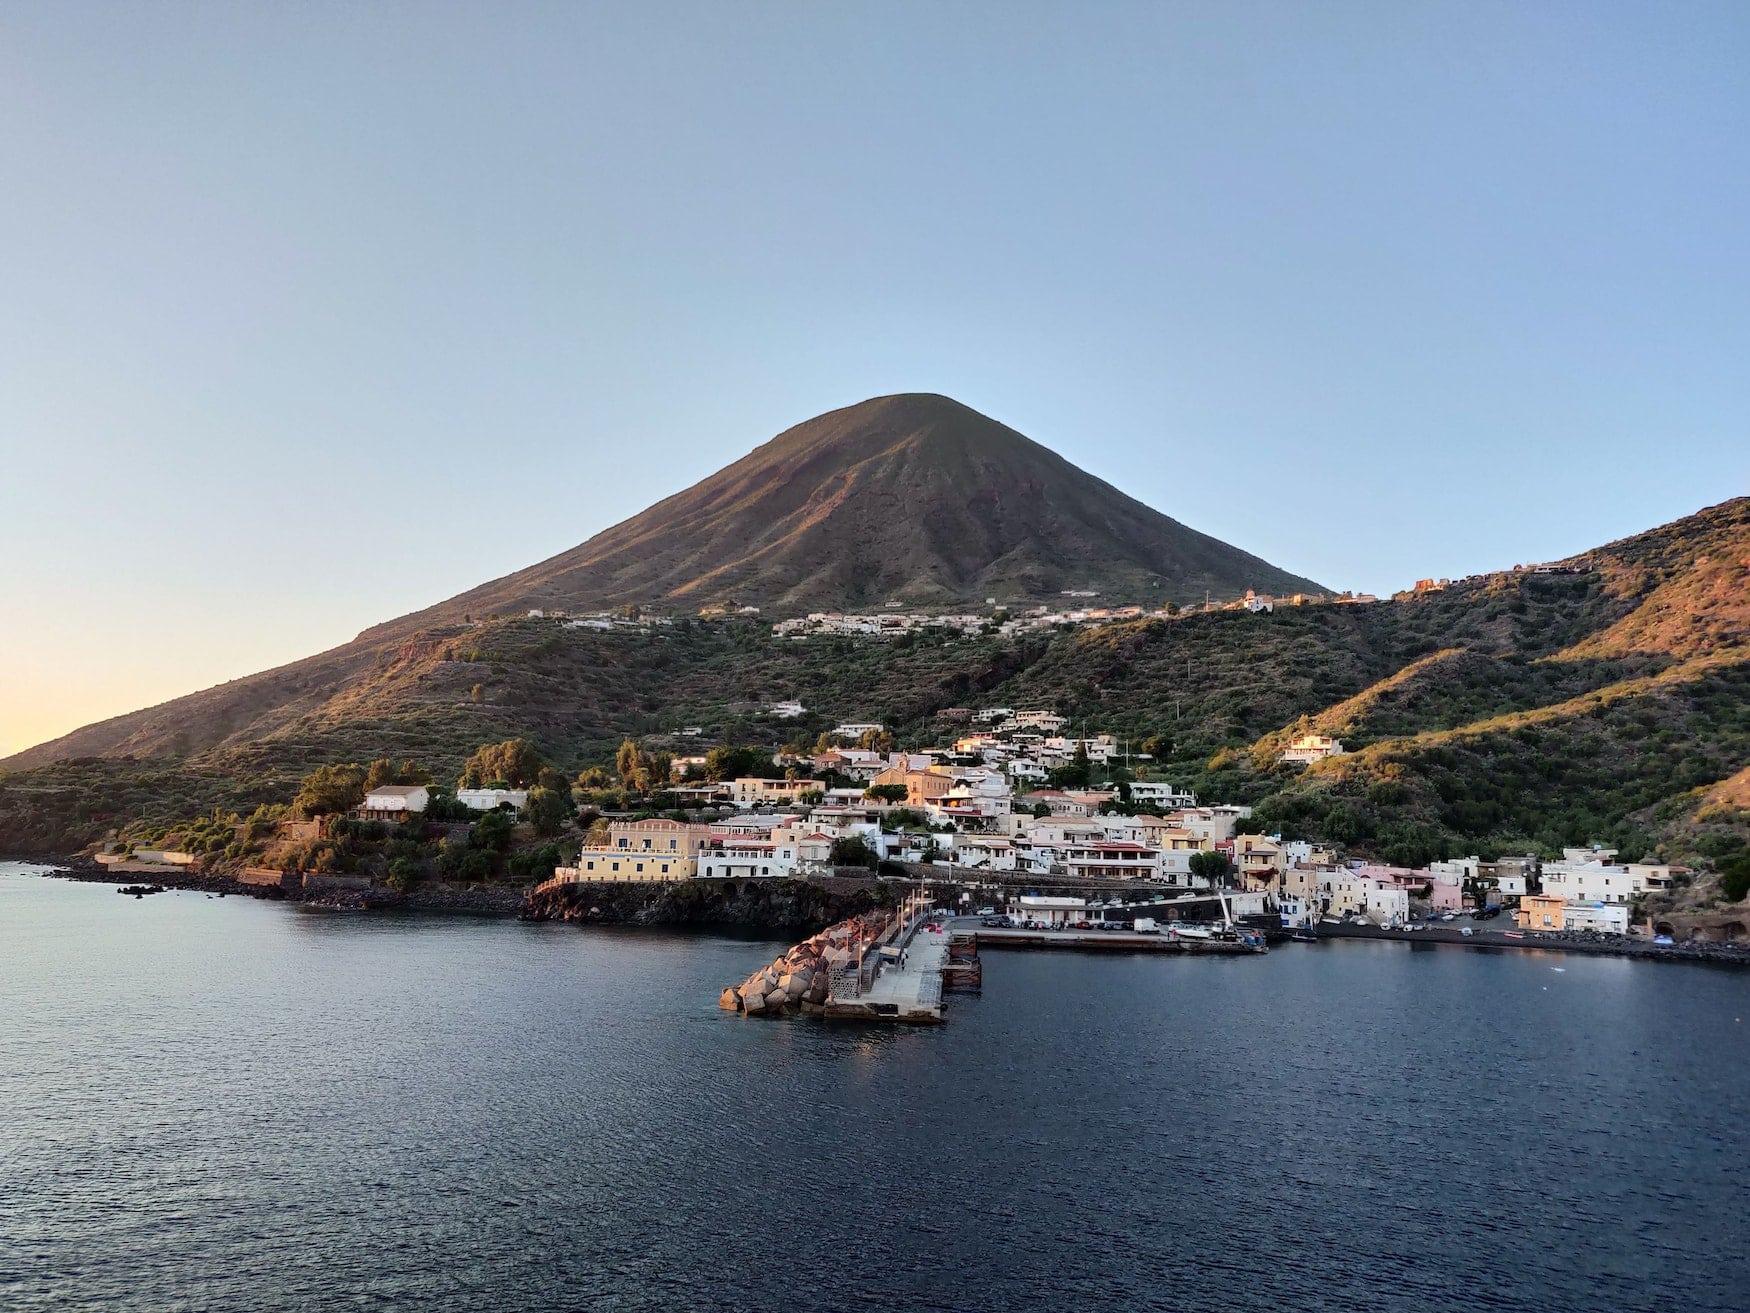 Die Vulkaninsel Salina vor Sizilien